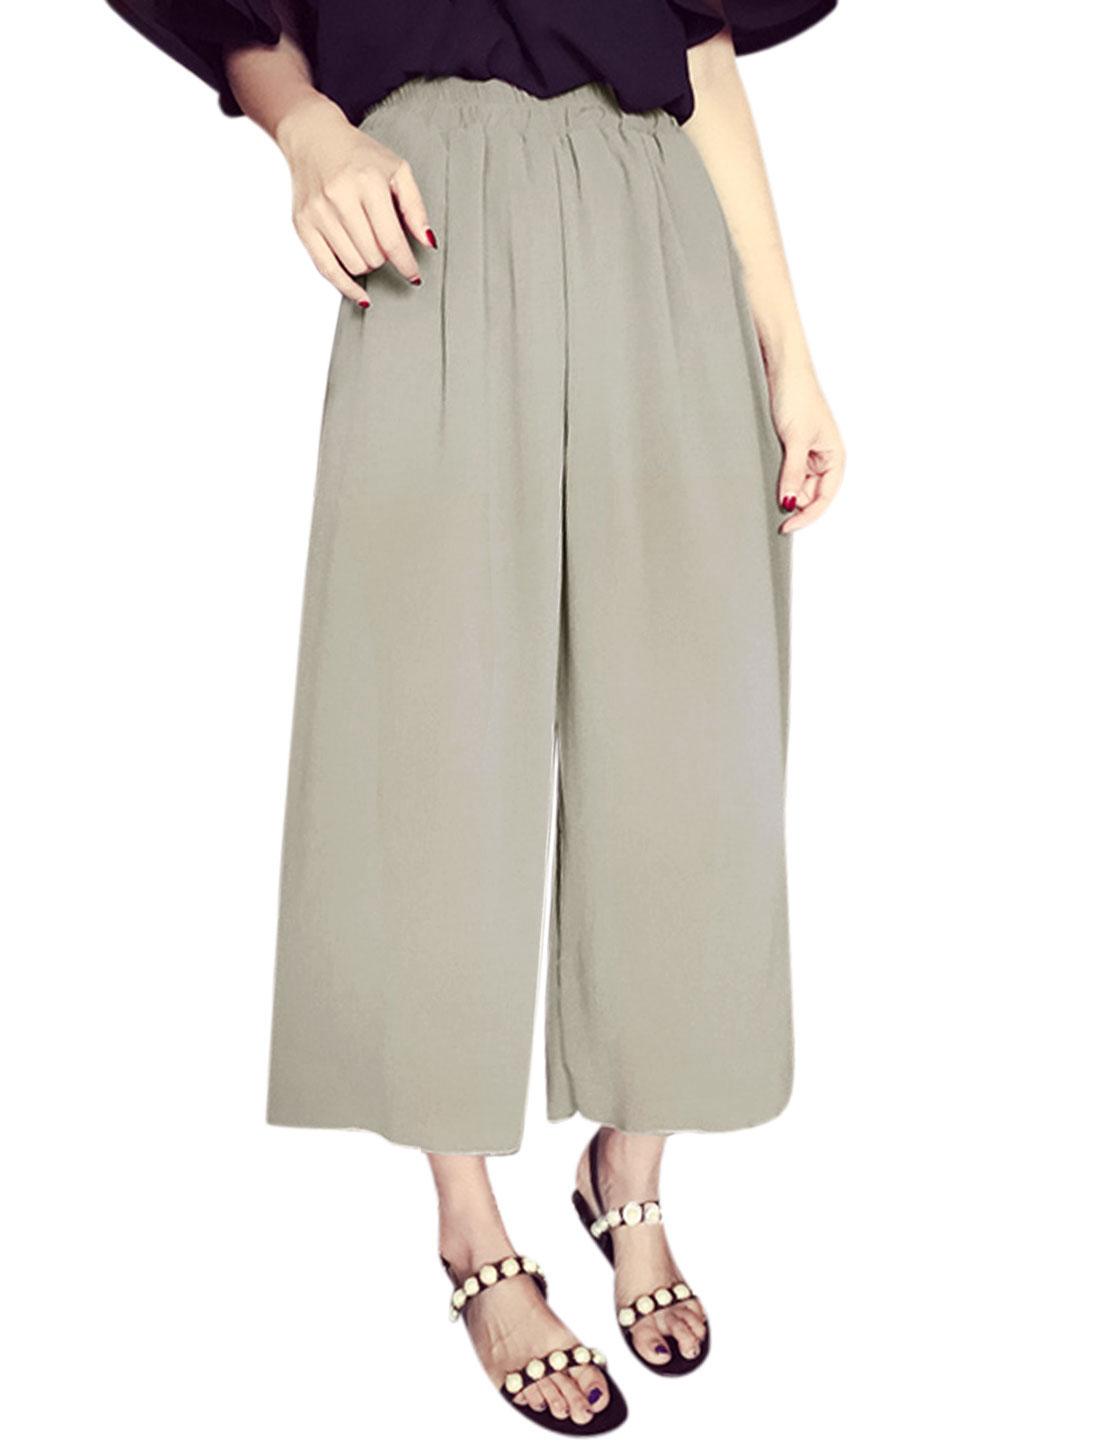 Women Elastic Waist Fully Lined Wide Leg Casual Capris Pants Dark Beige XS